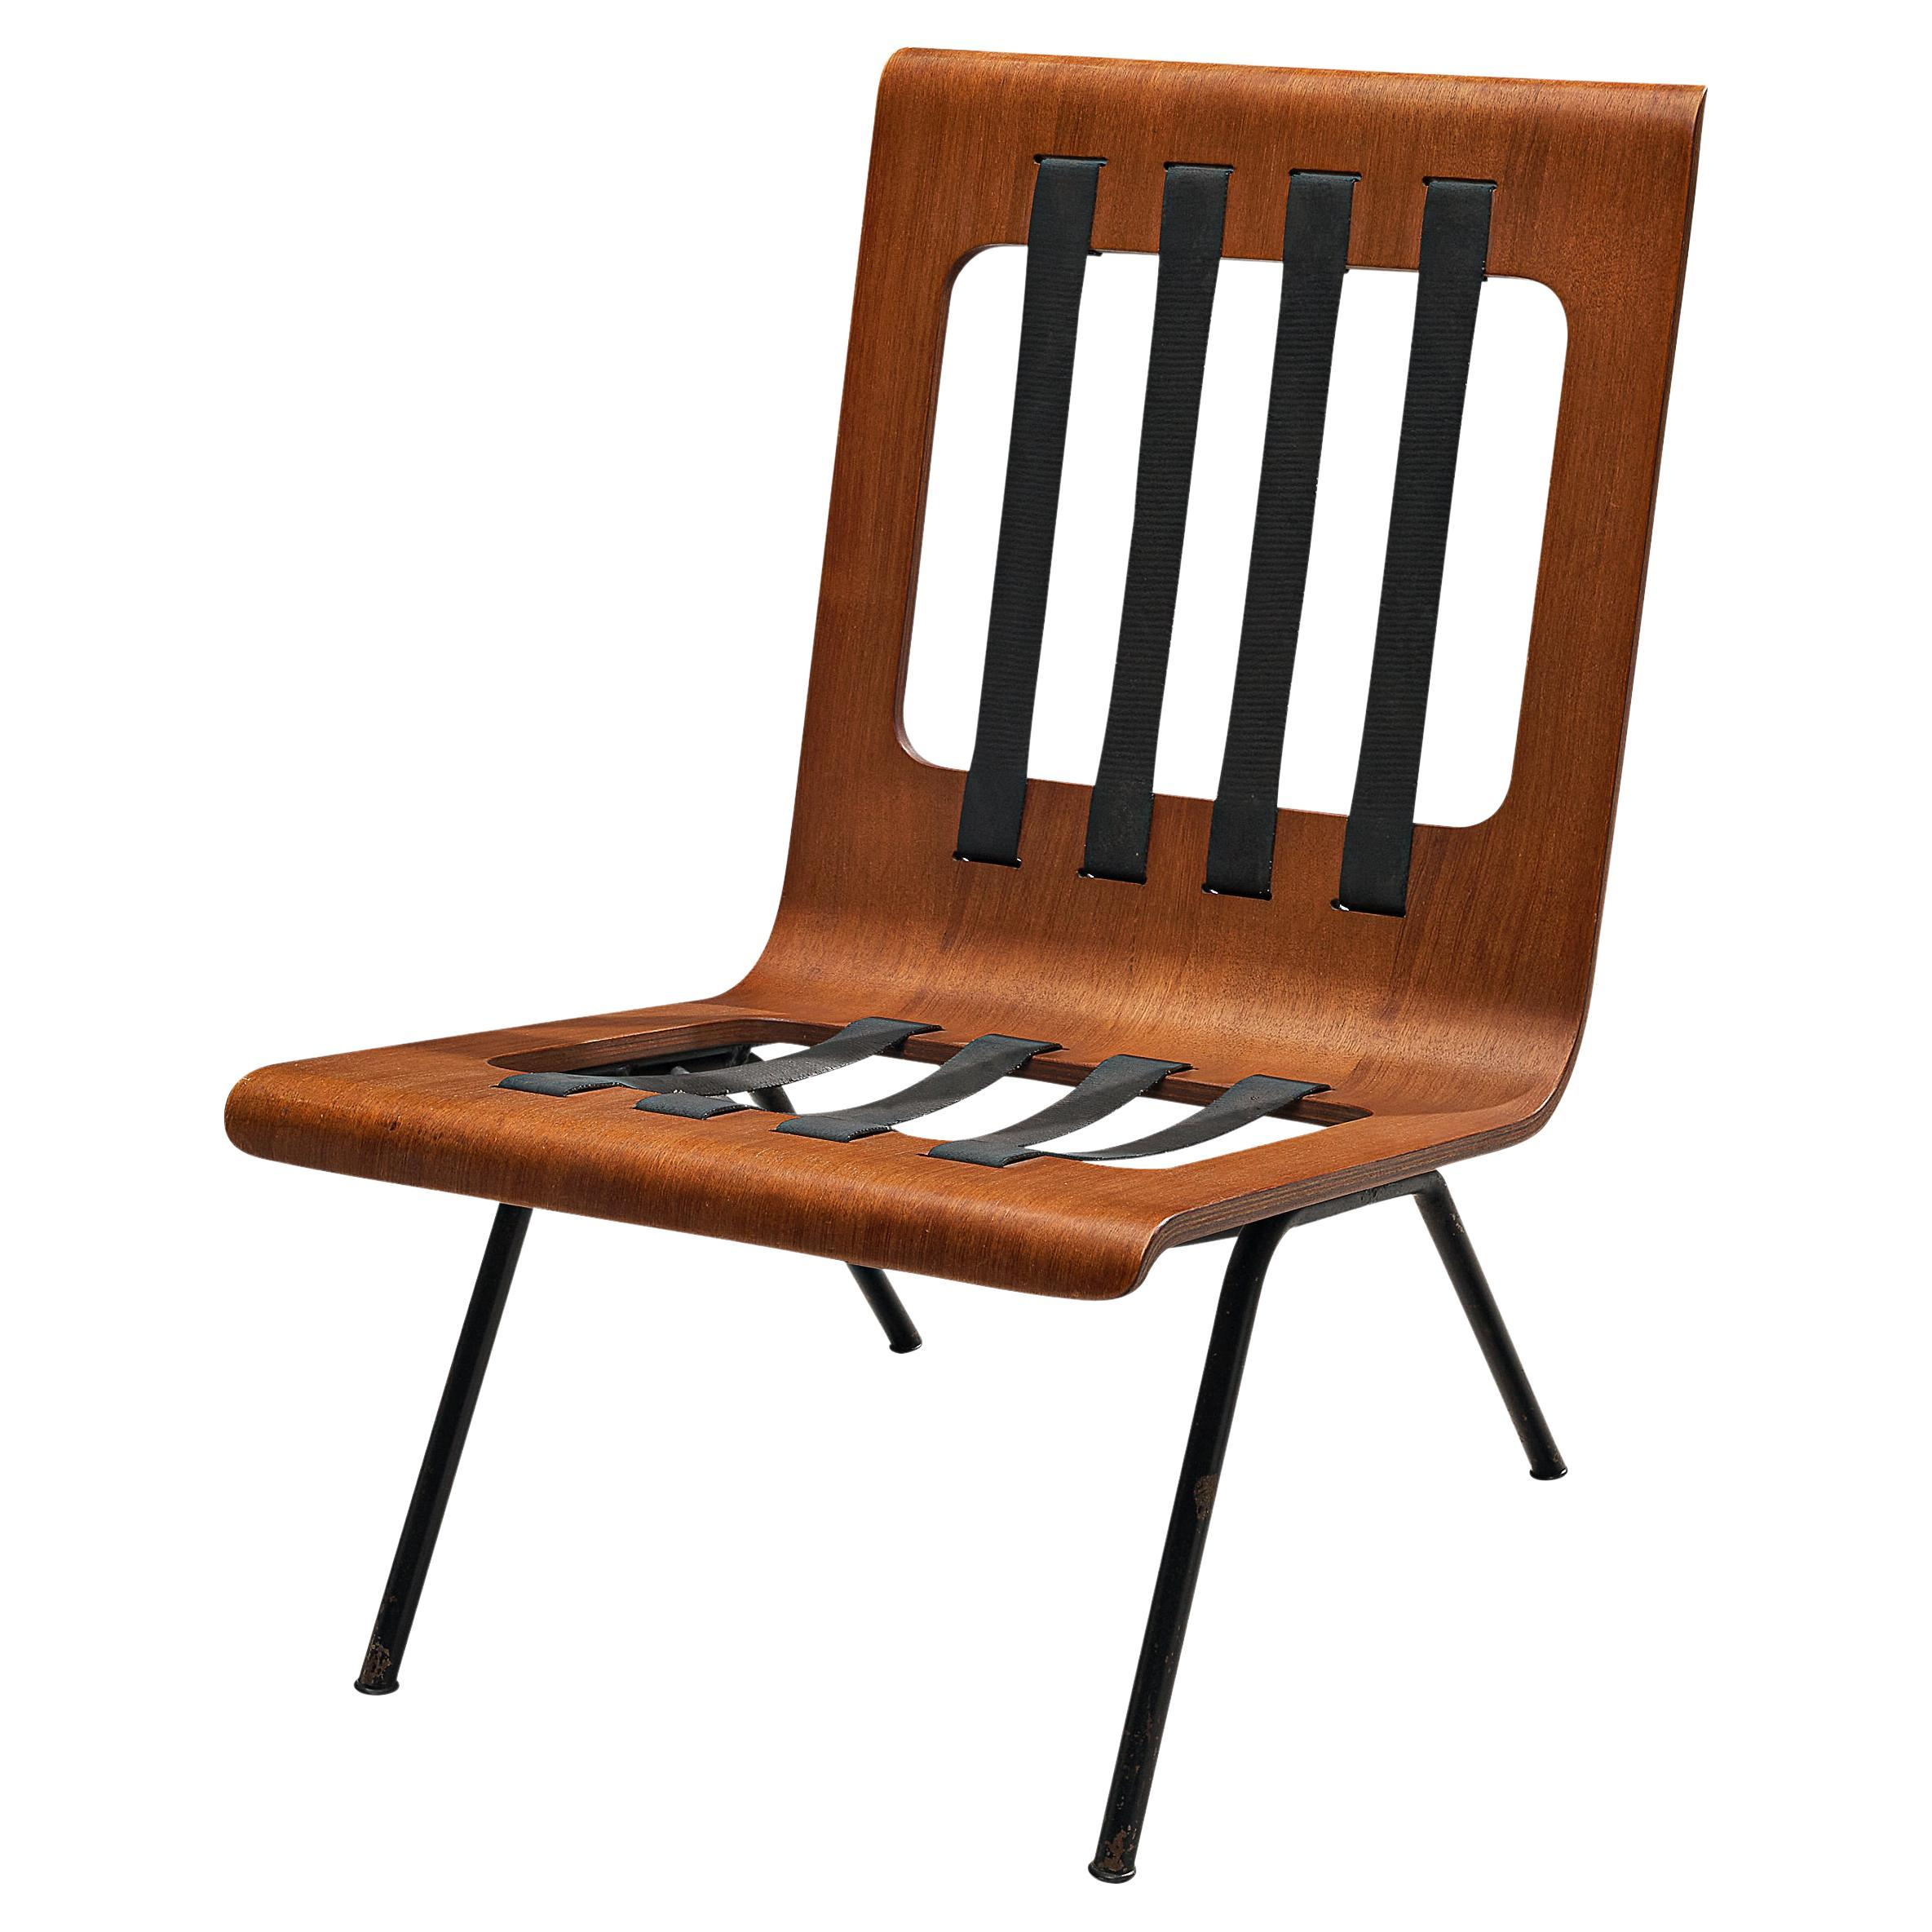 Sculptural Italian Lounge Chair in Bent Teak